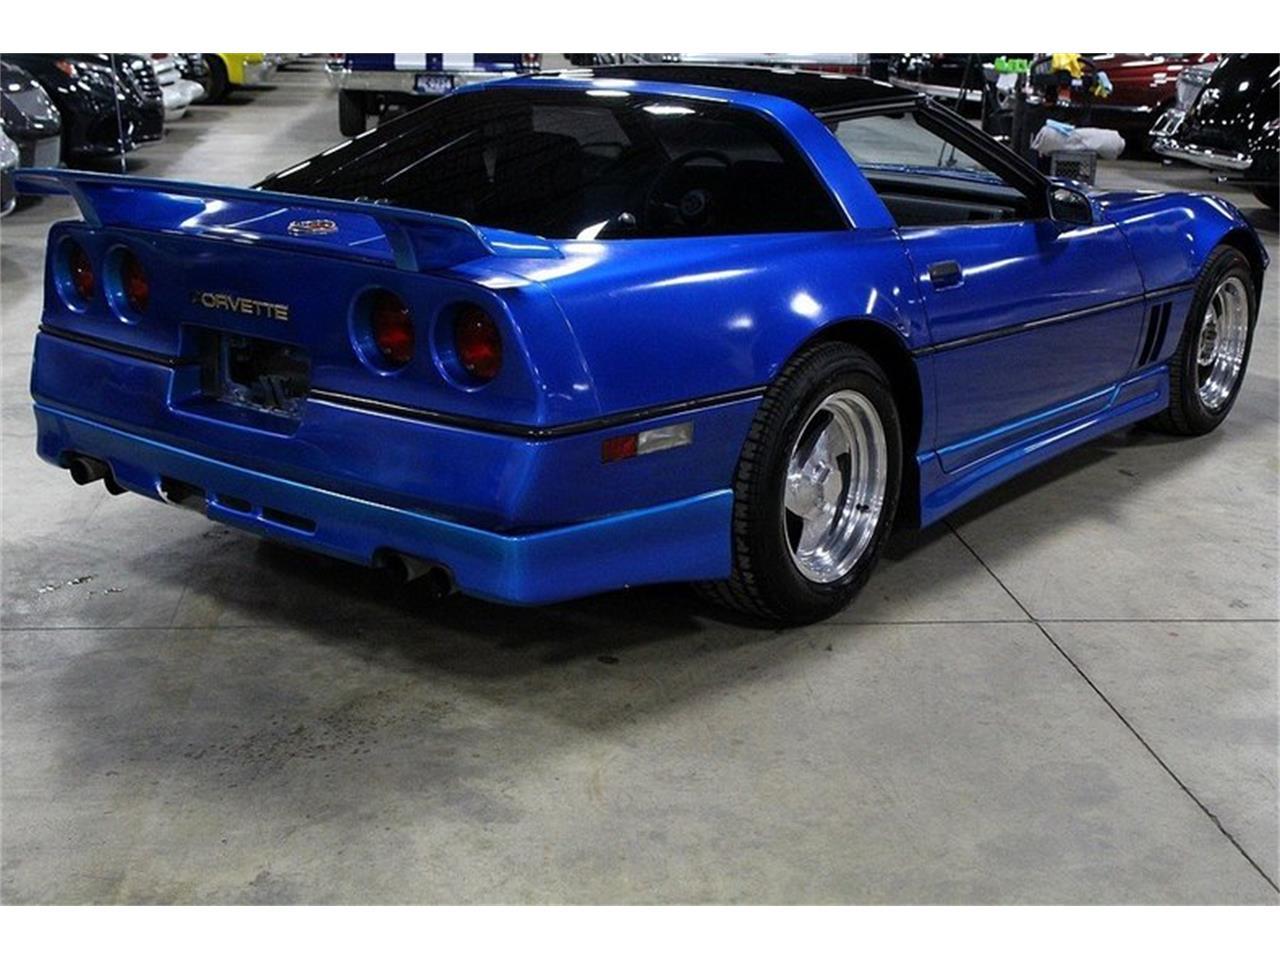 Large Picture of 1985 Chevrolet Corvette - $9,900.00 - LBV1